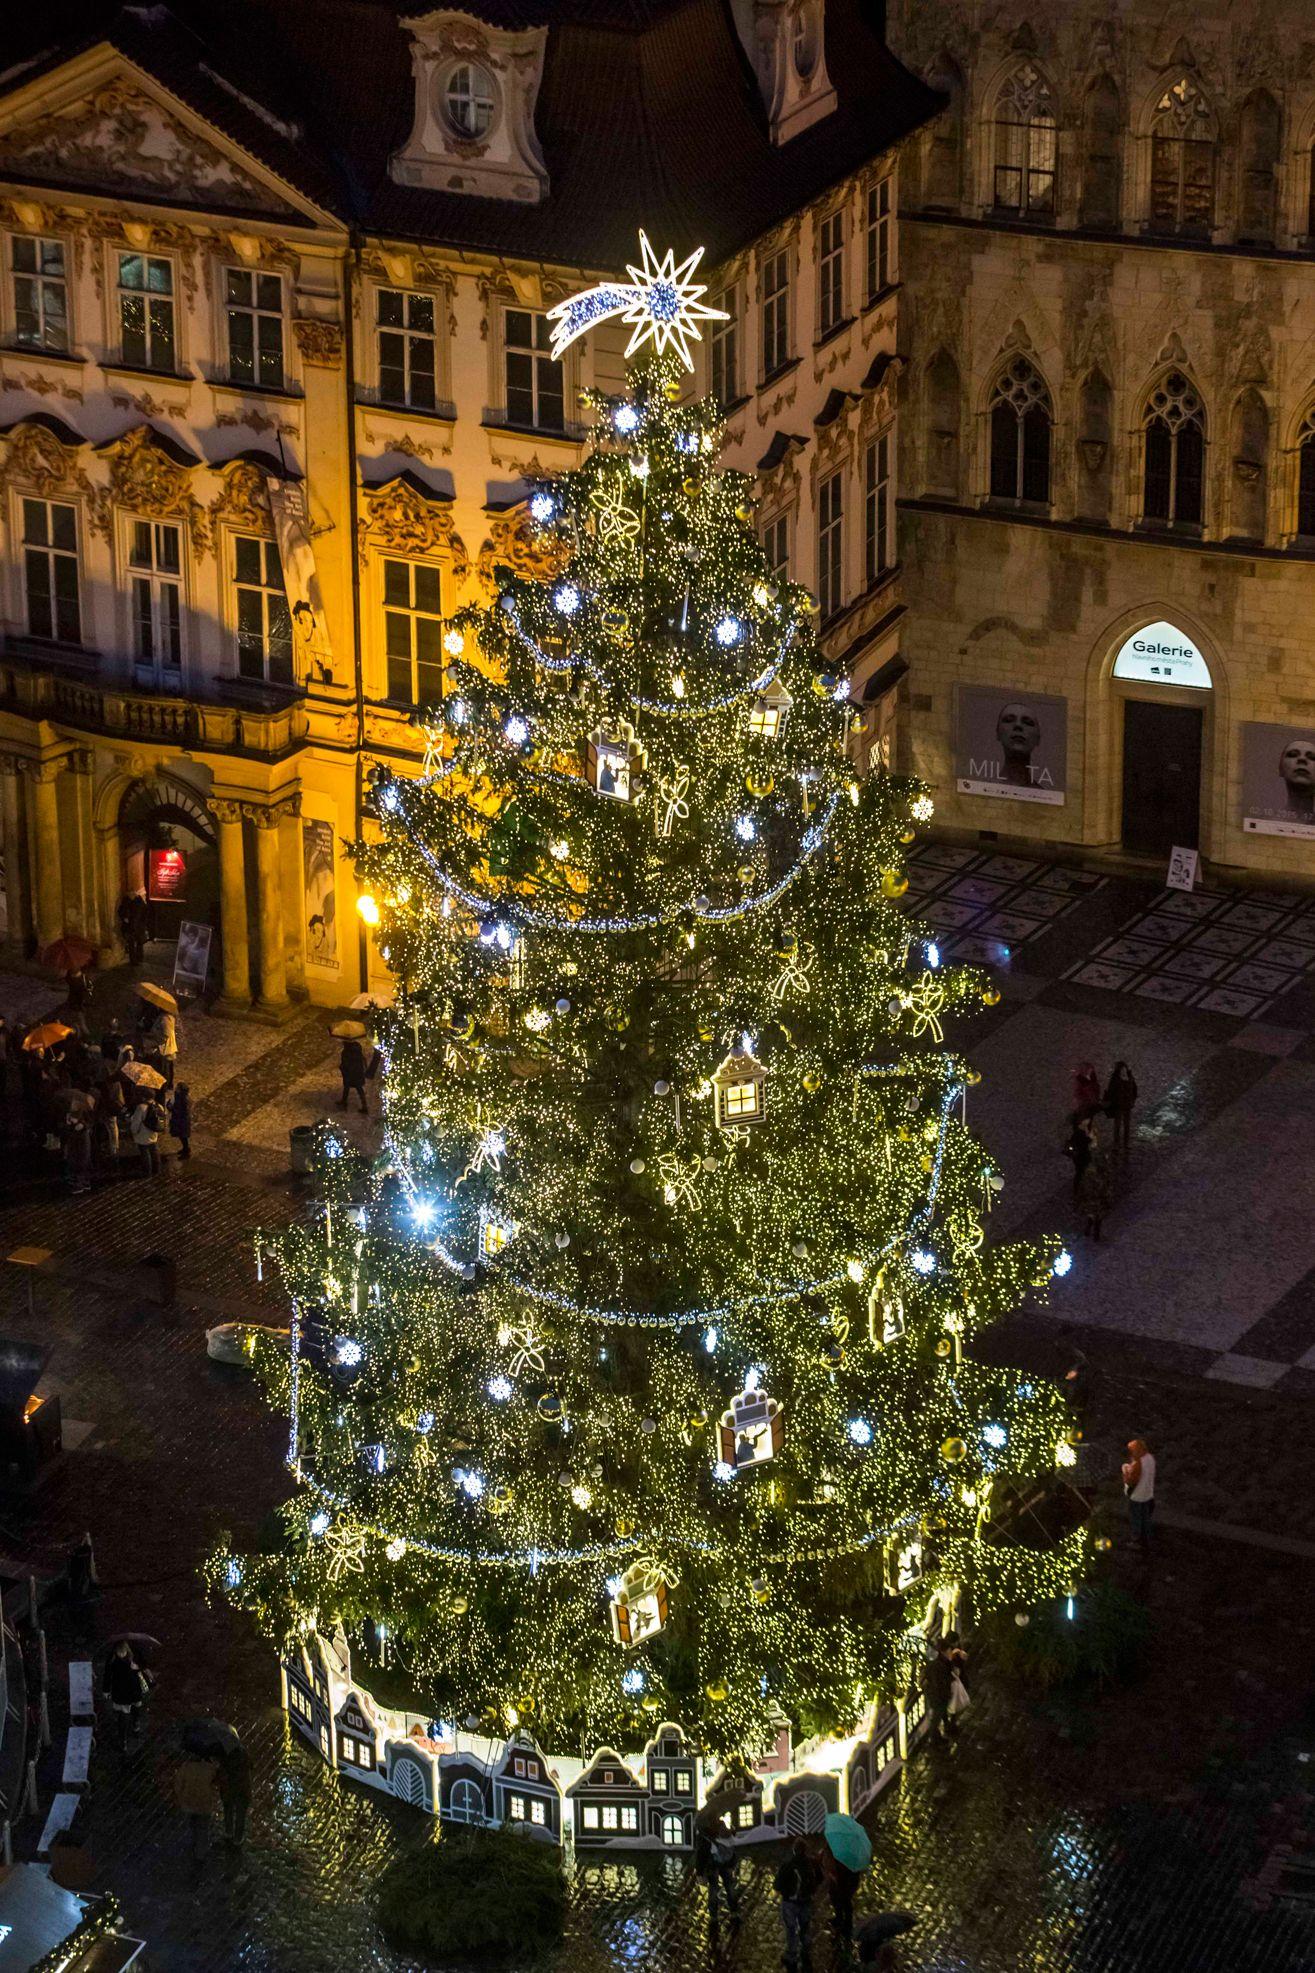 magical christmas trees worth seeing christmas tree virtual tour